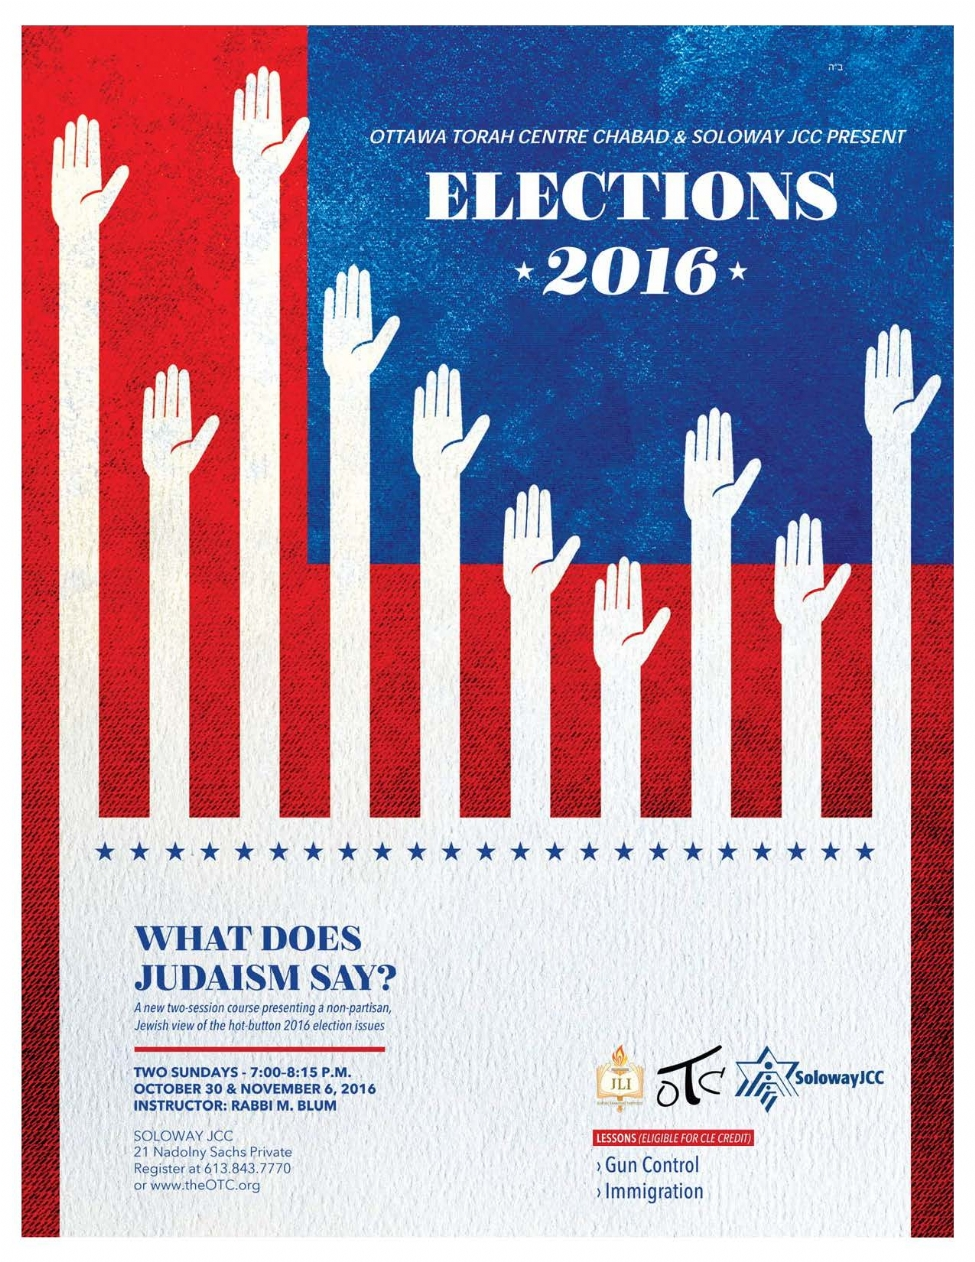 ELECTION 8 w logos.jpg